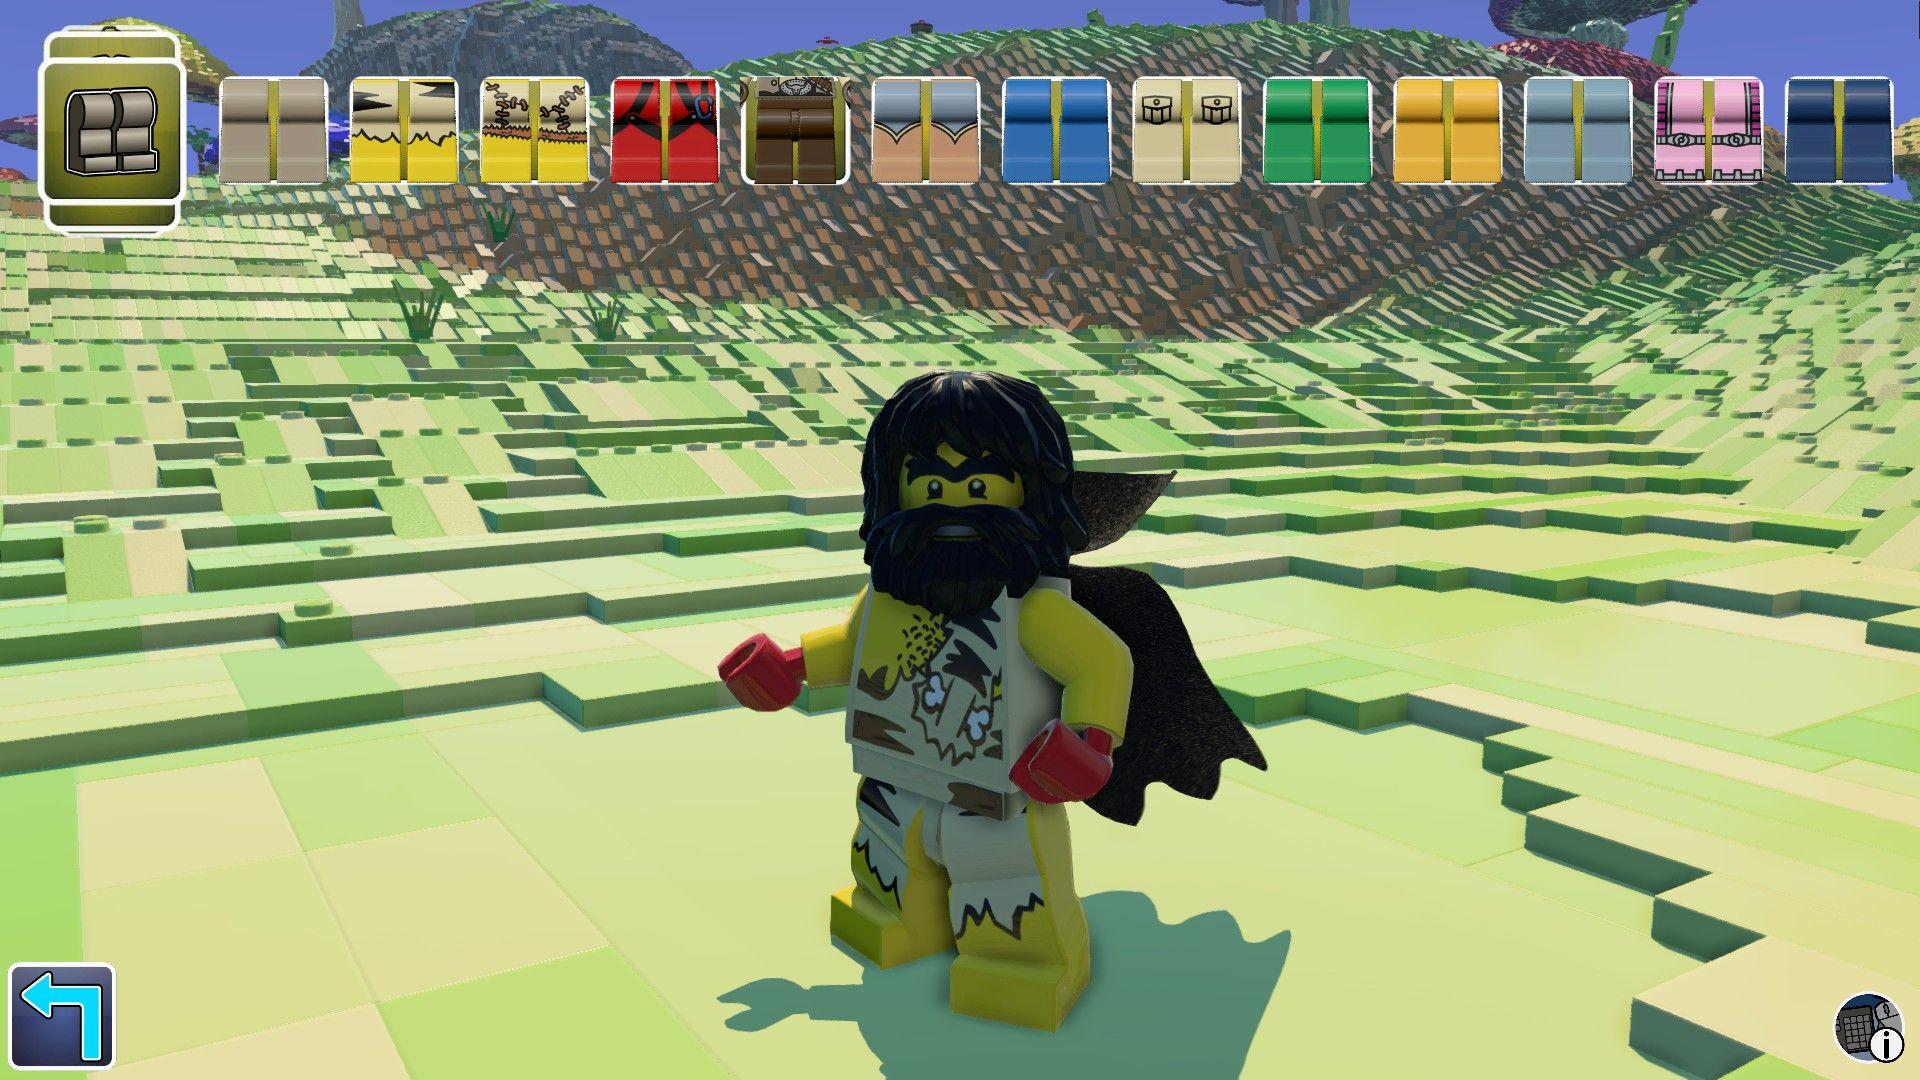 LEGO Worlds (Xbox One) - 8